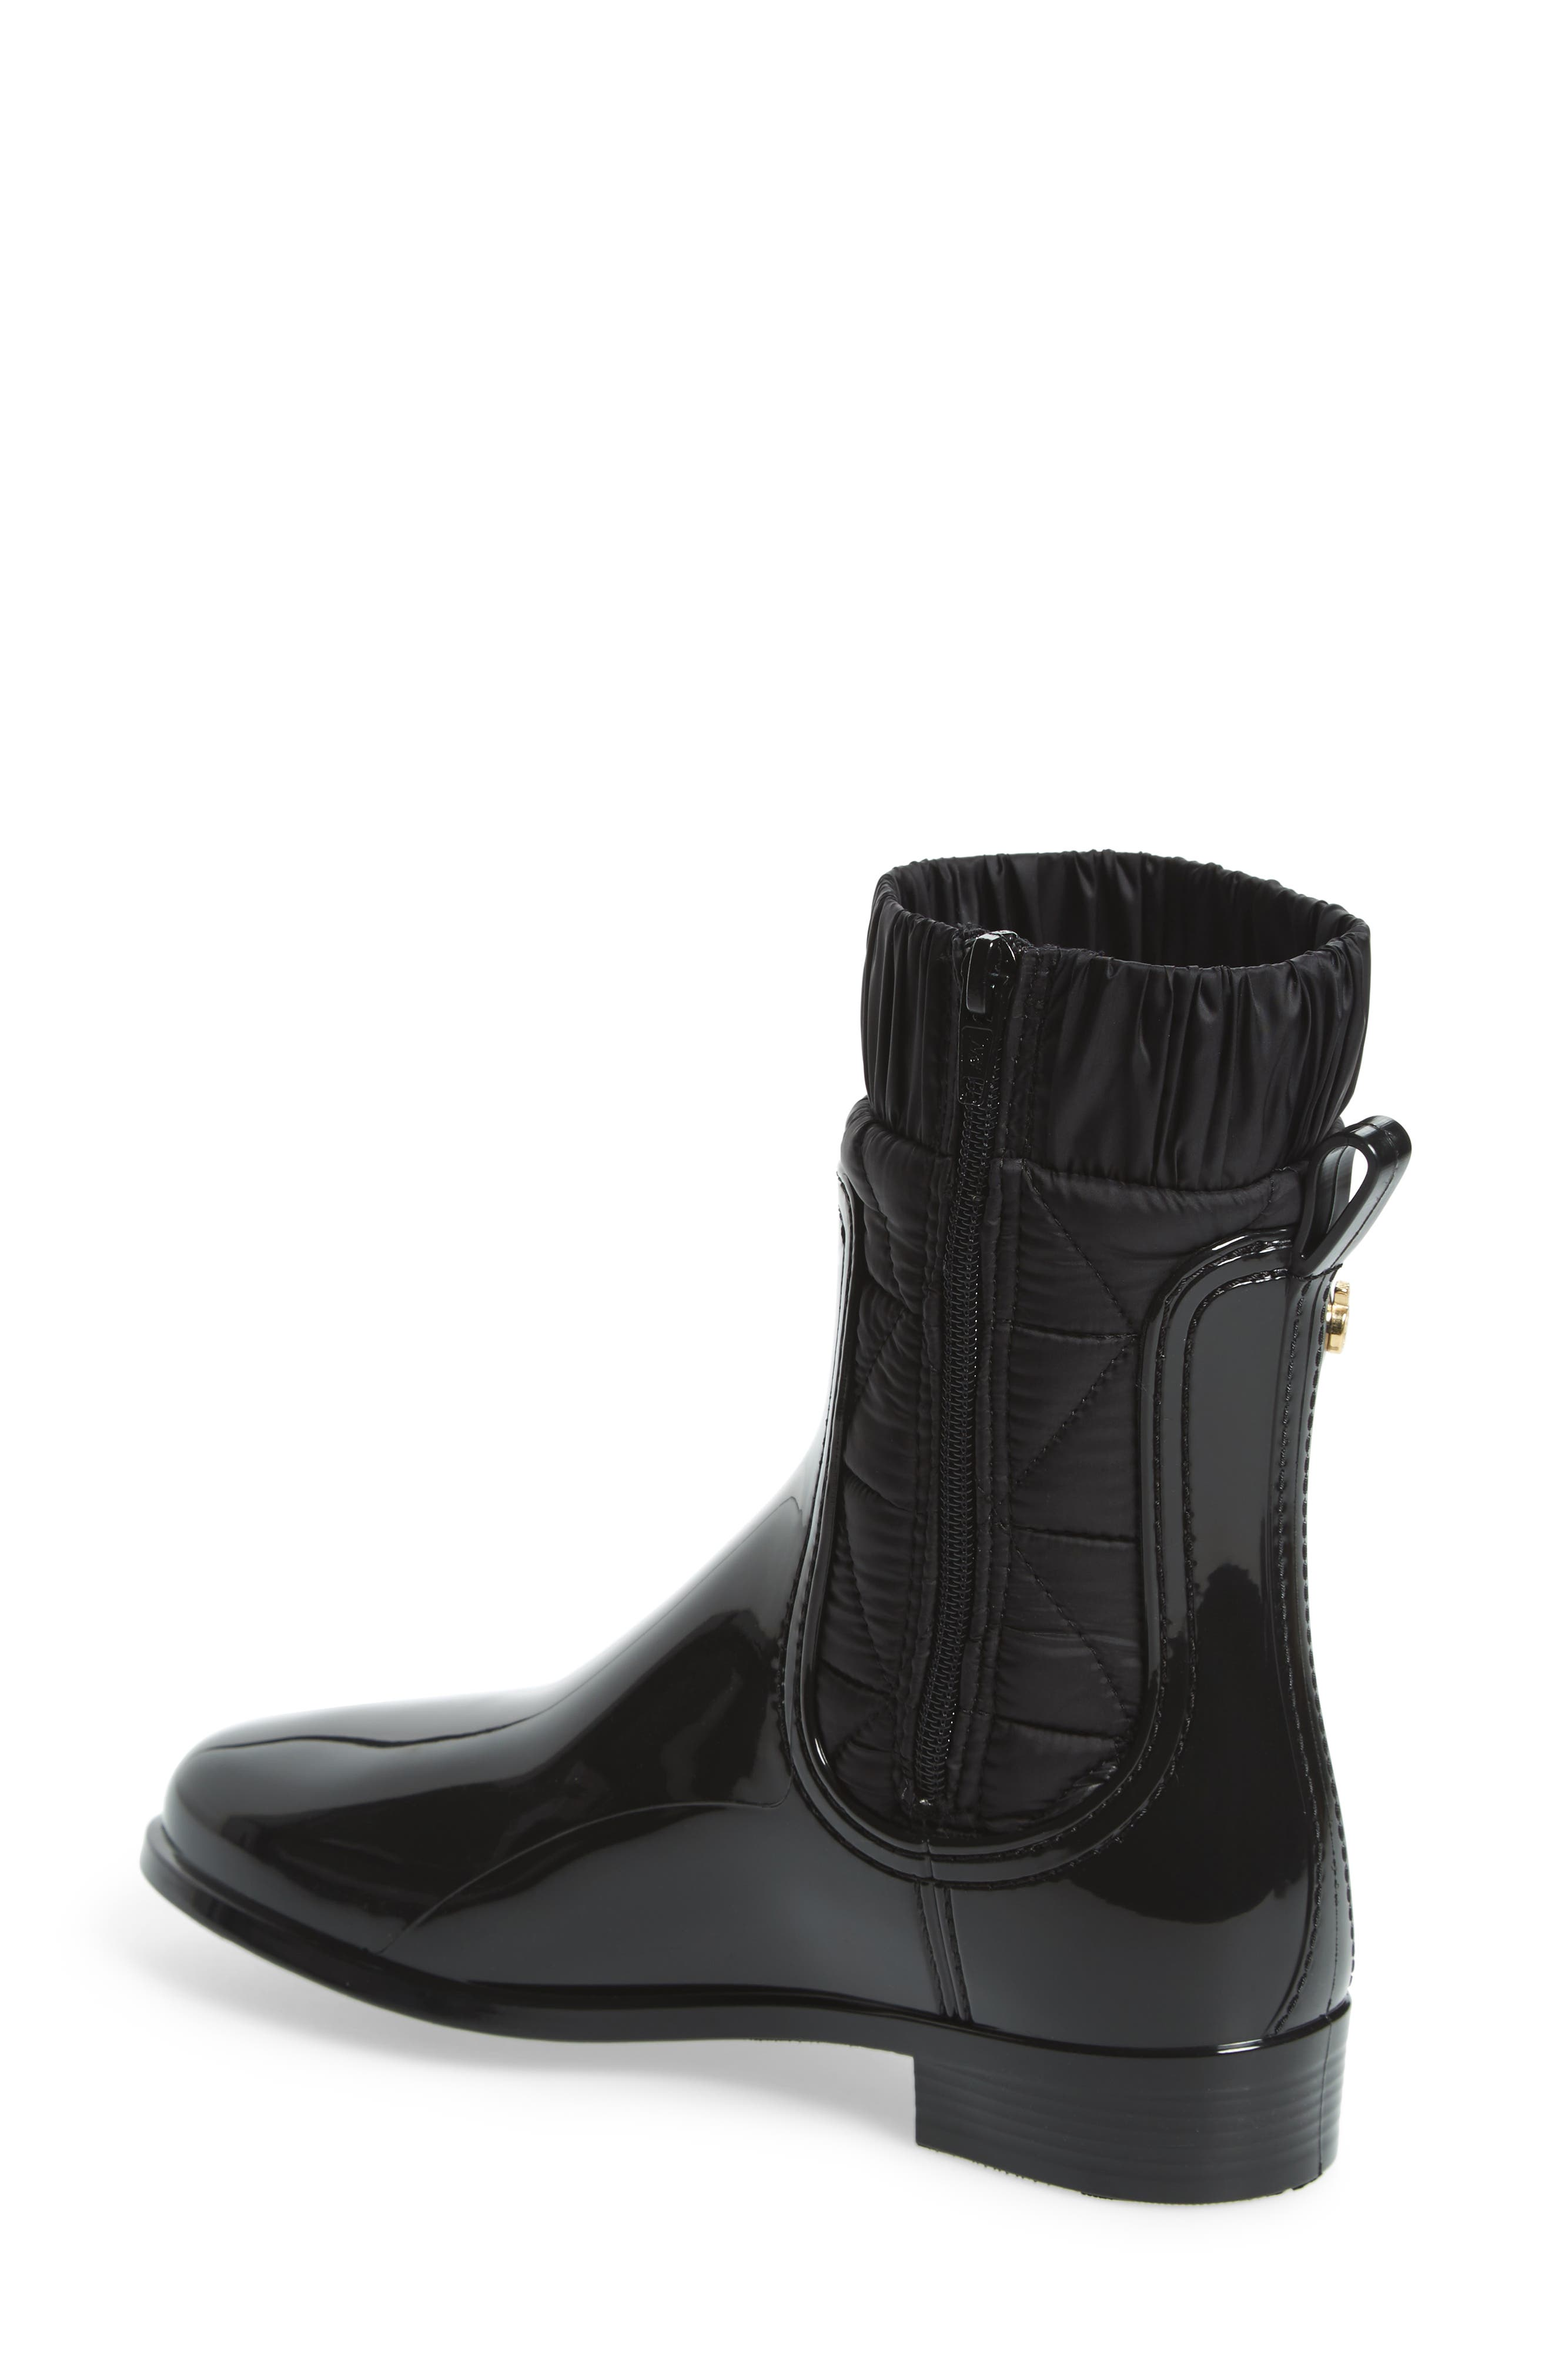 Adele Waterproof Boot,                             Alternate thumbnail 2, color,                             001